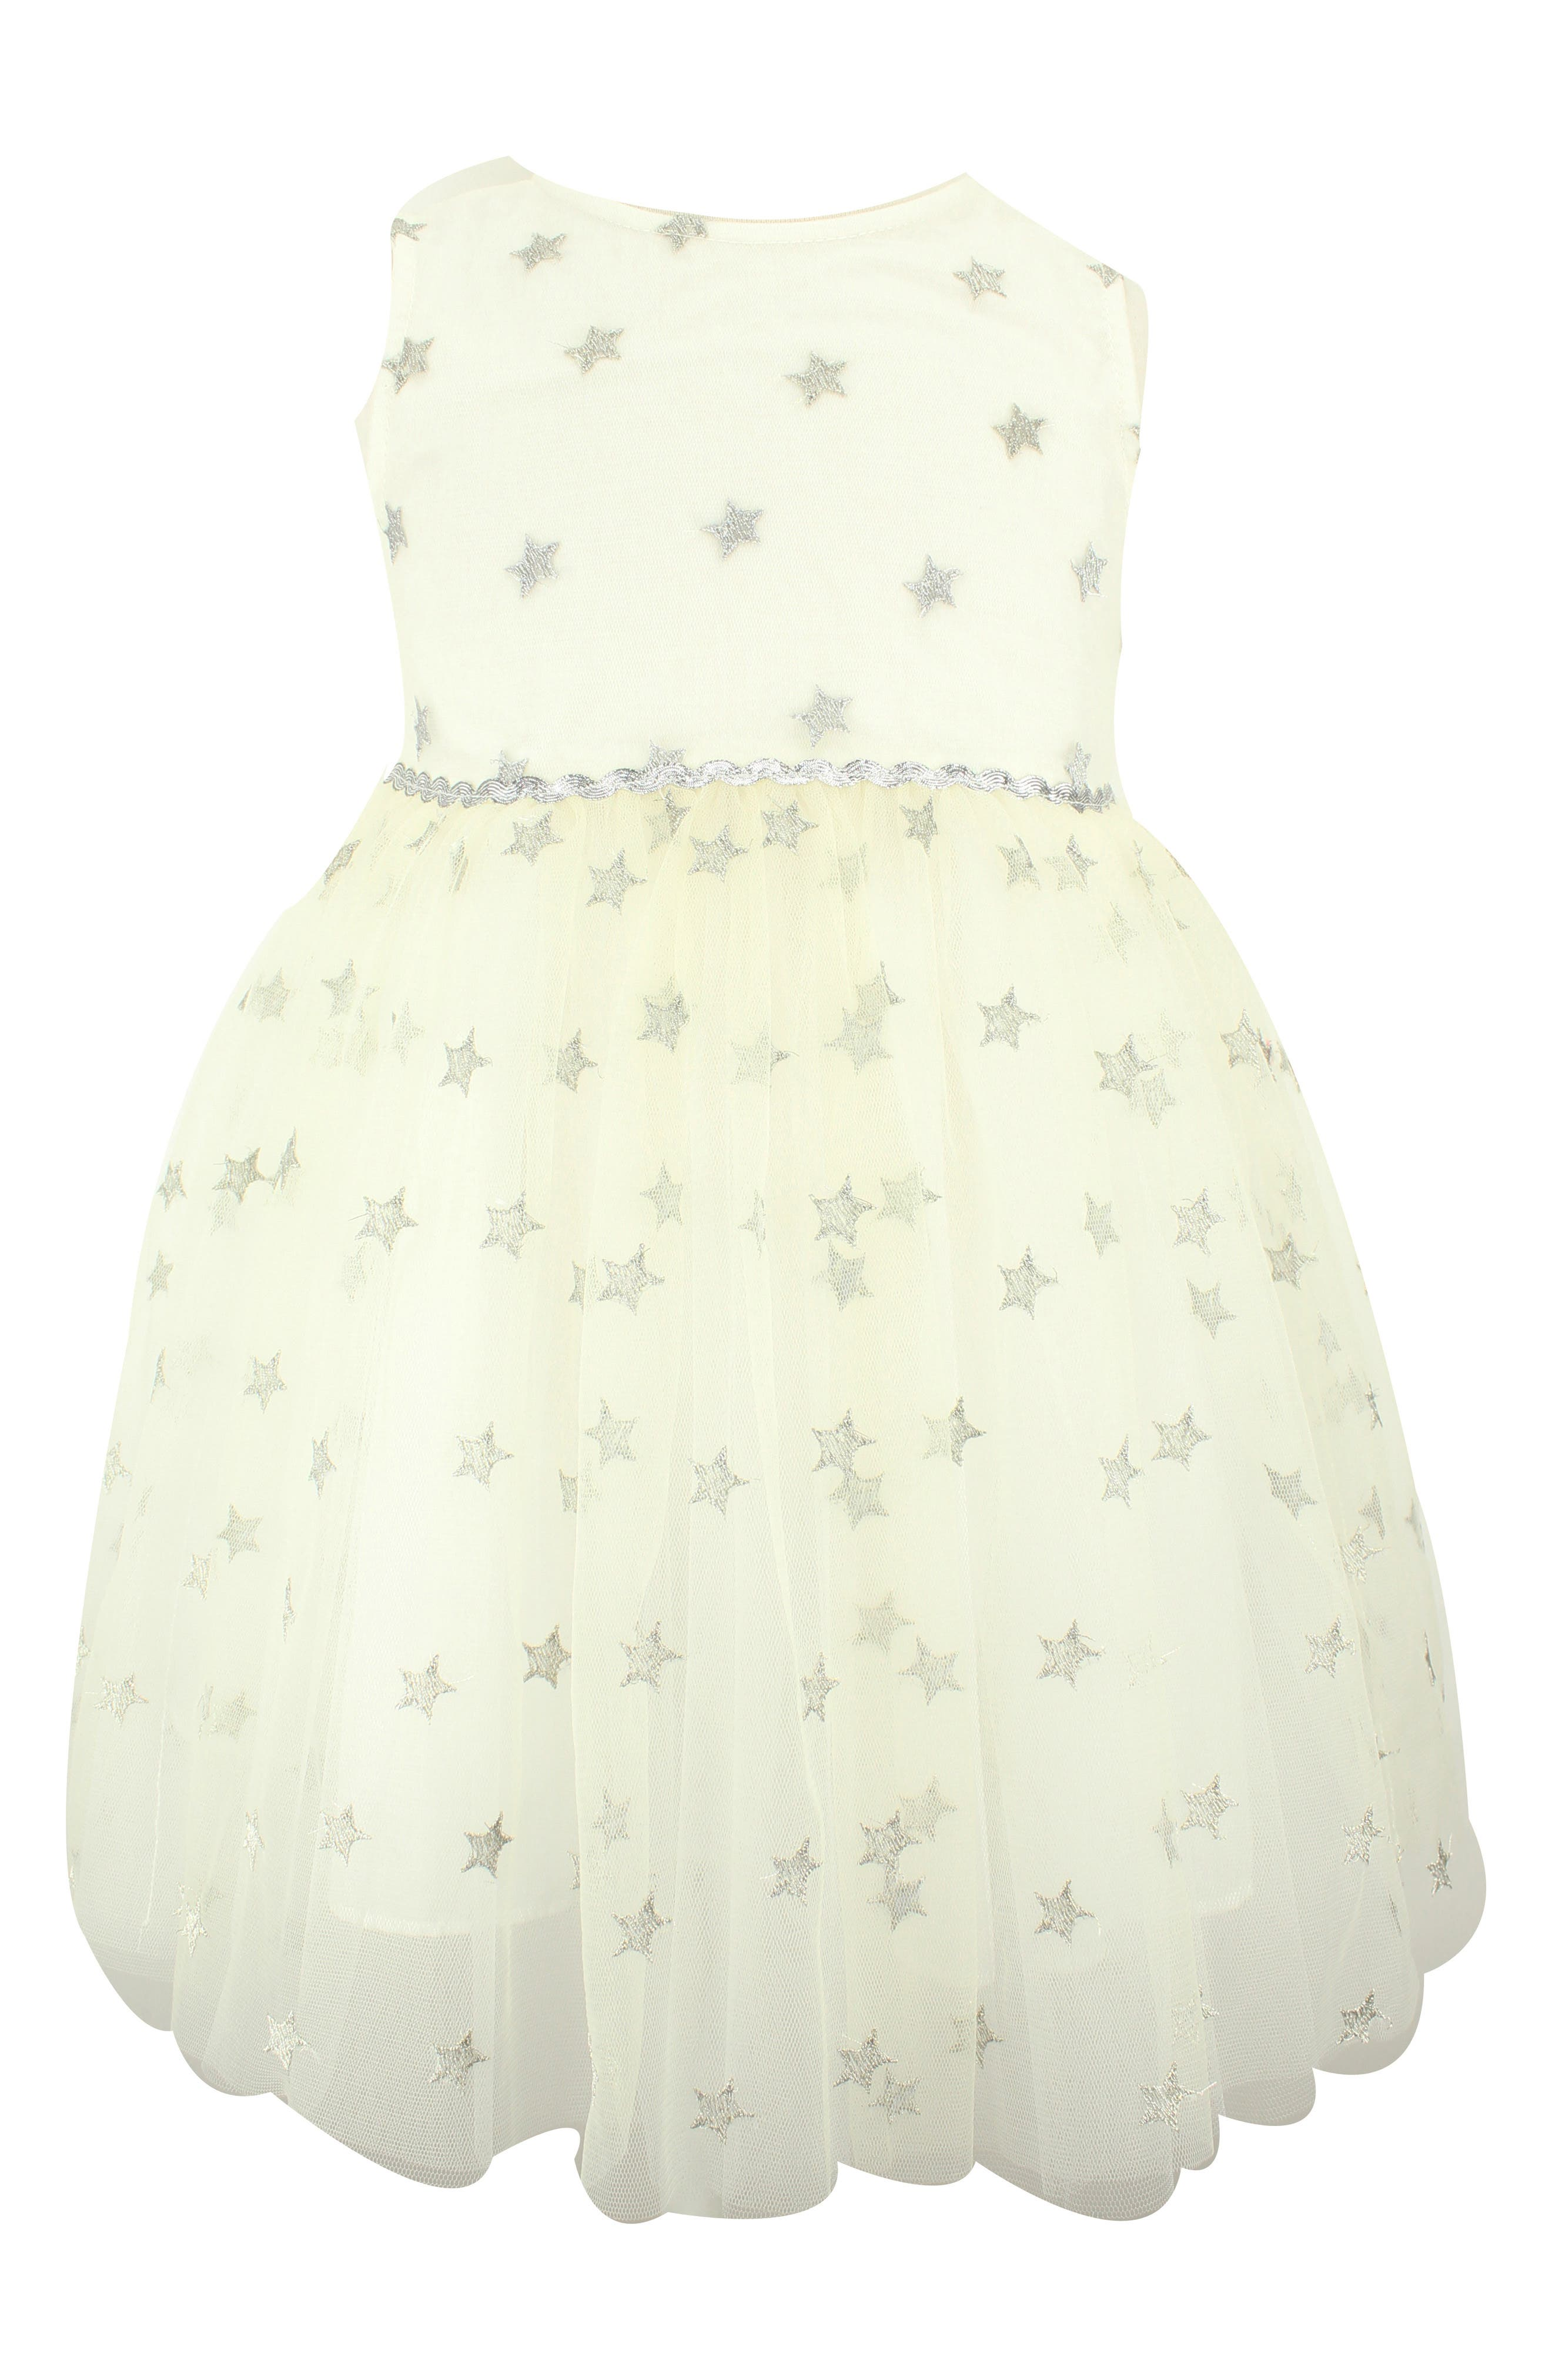 POPATU Metallic Star Tulle Dress, Main, color, SILVER/ WHITE